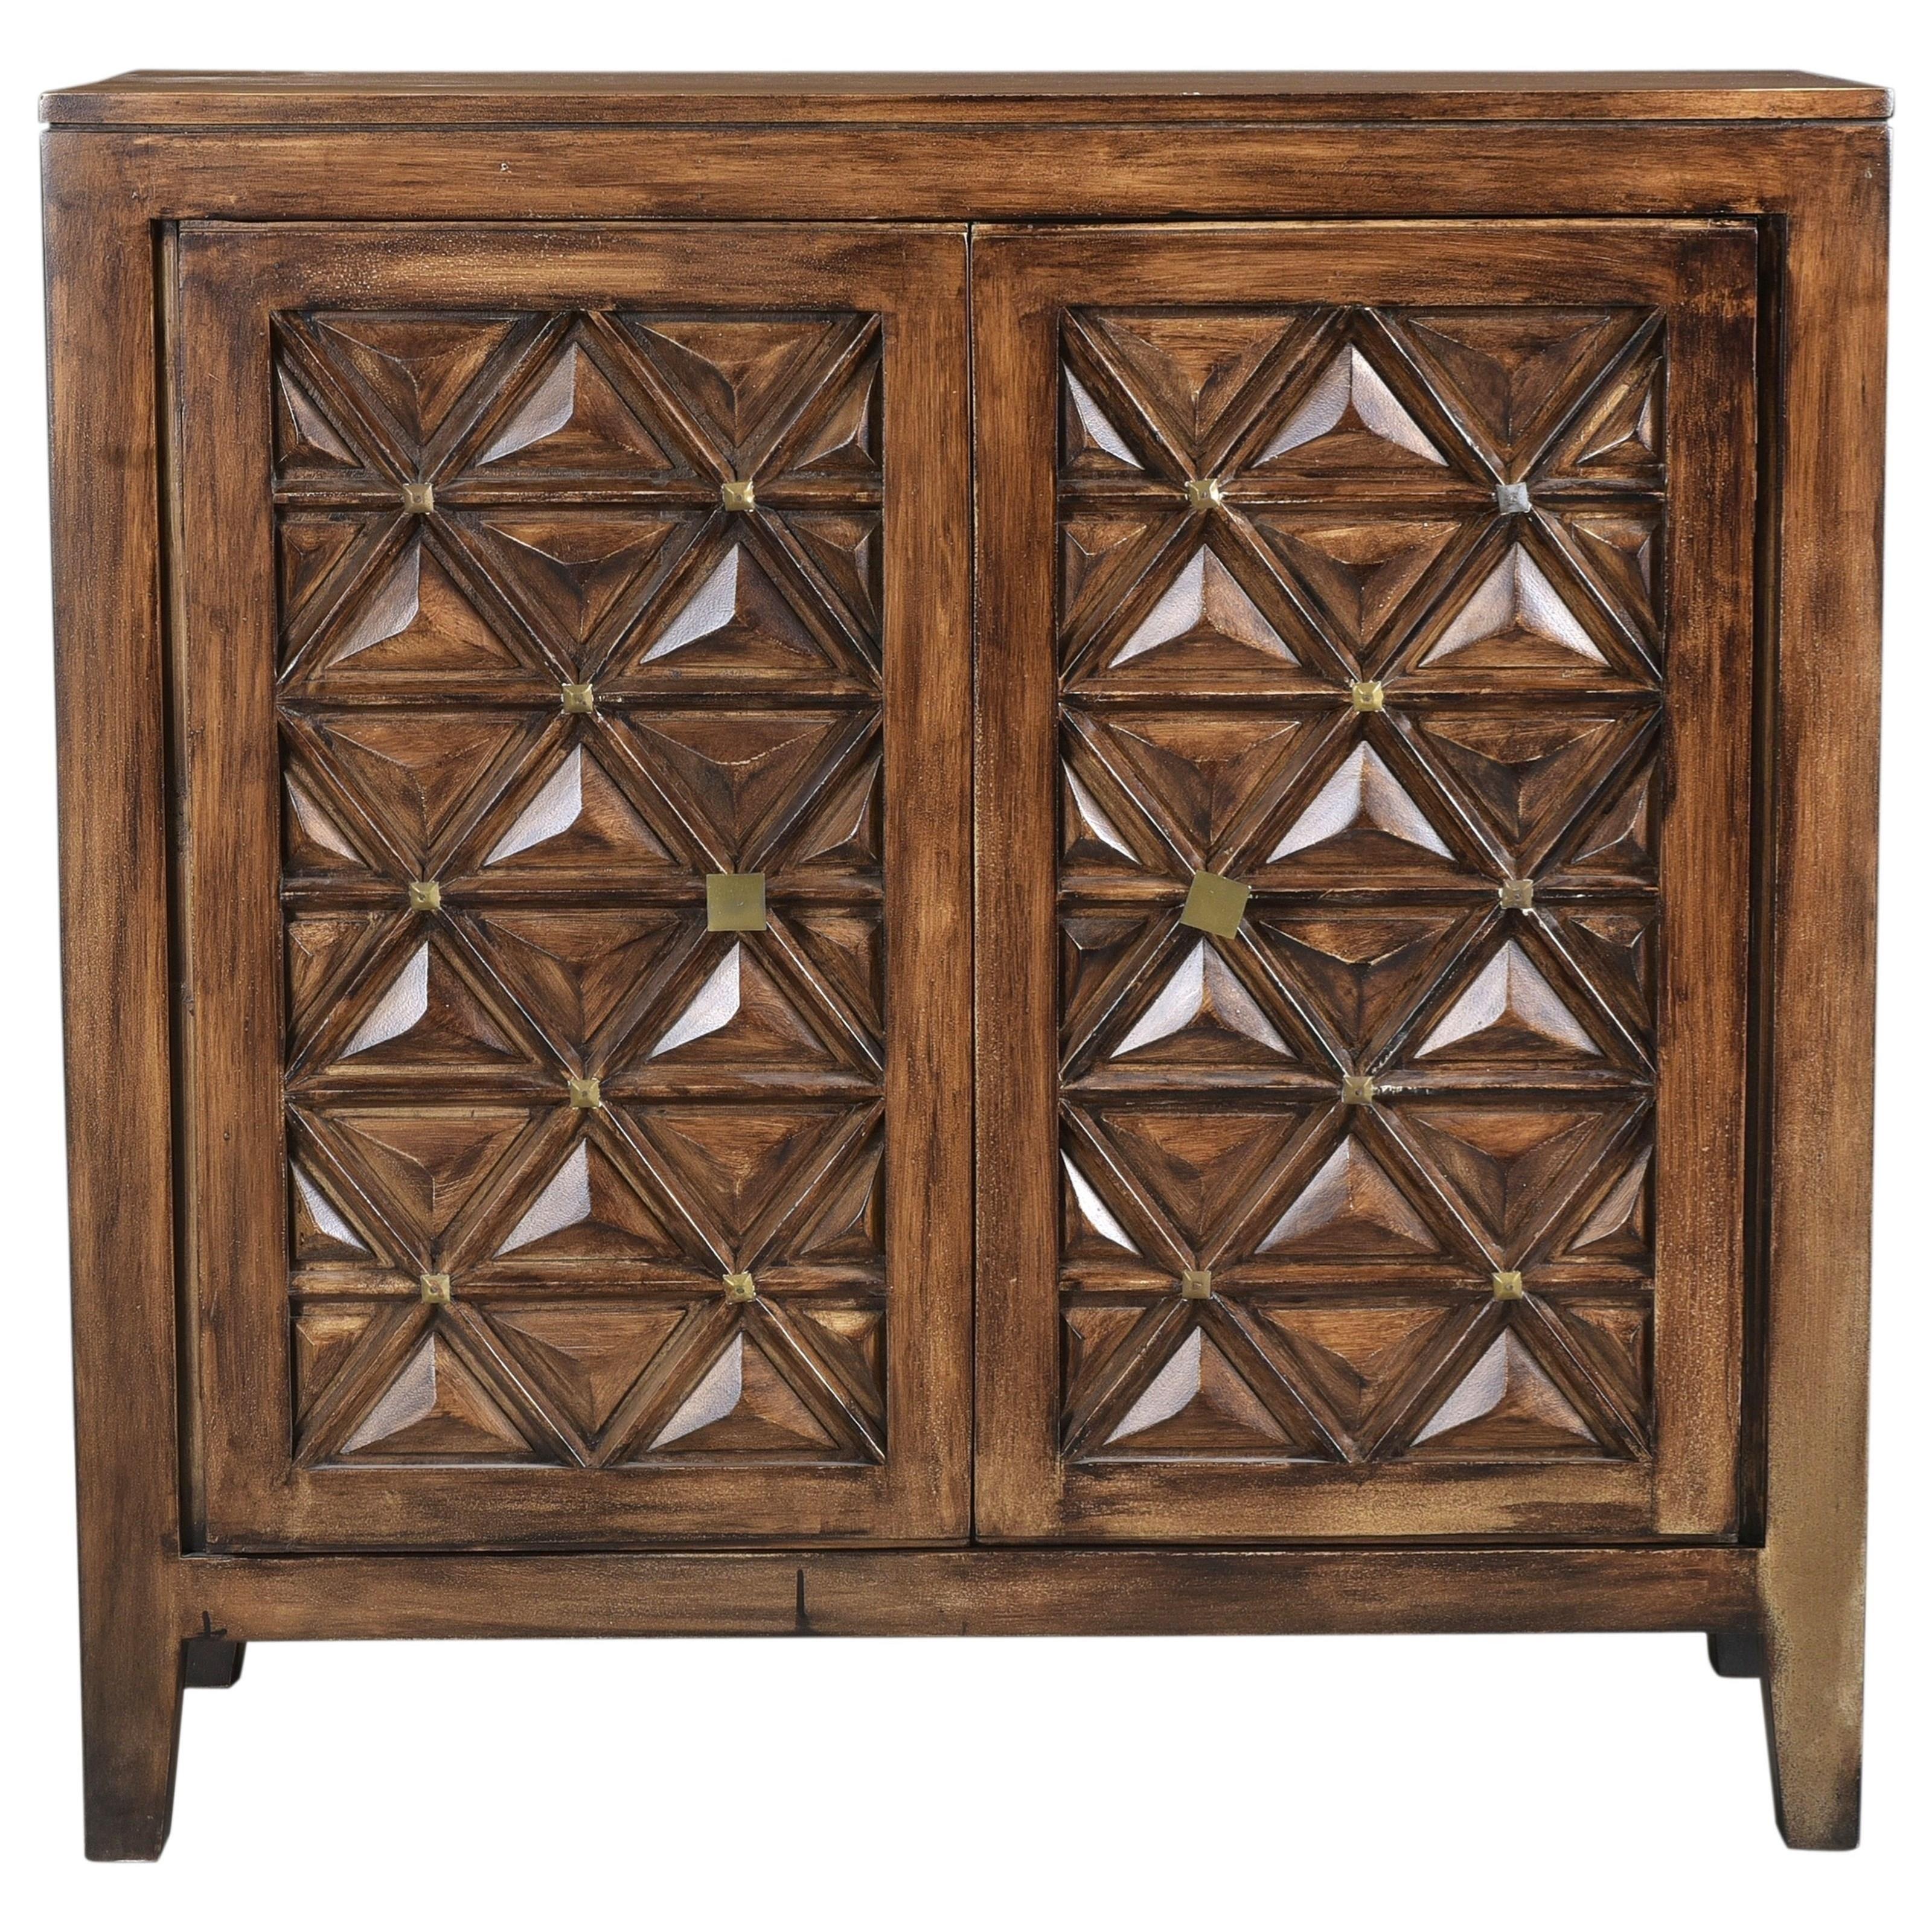 Regent Accent Cabinet by Steve Silver at Walker's Furniture